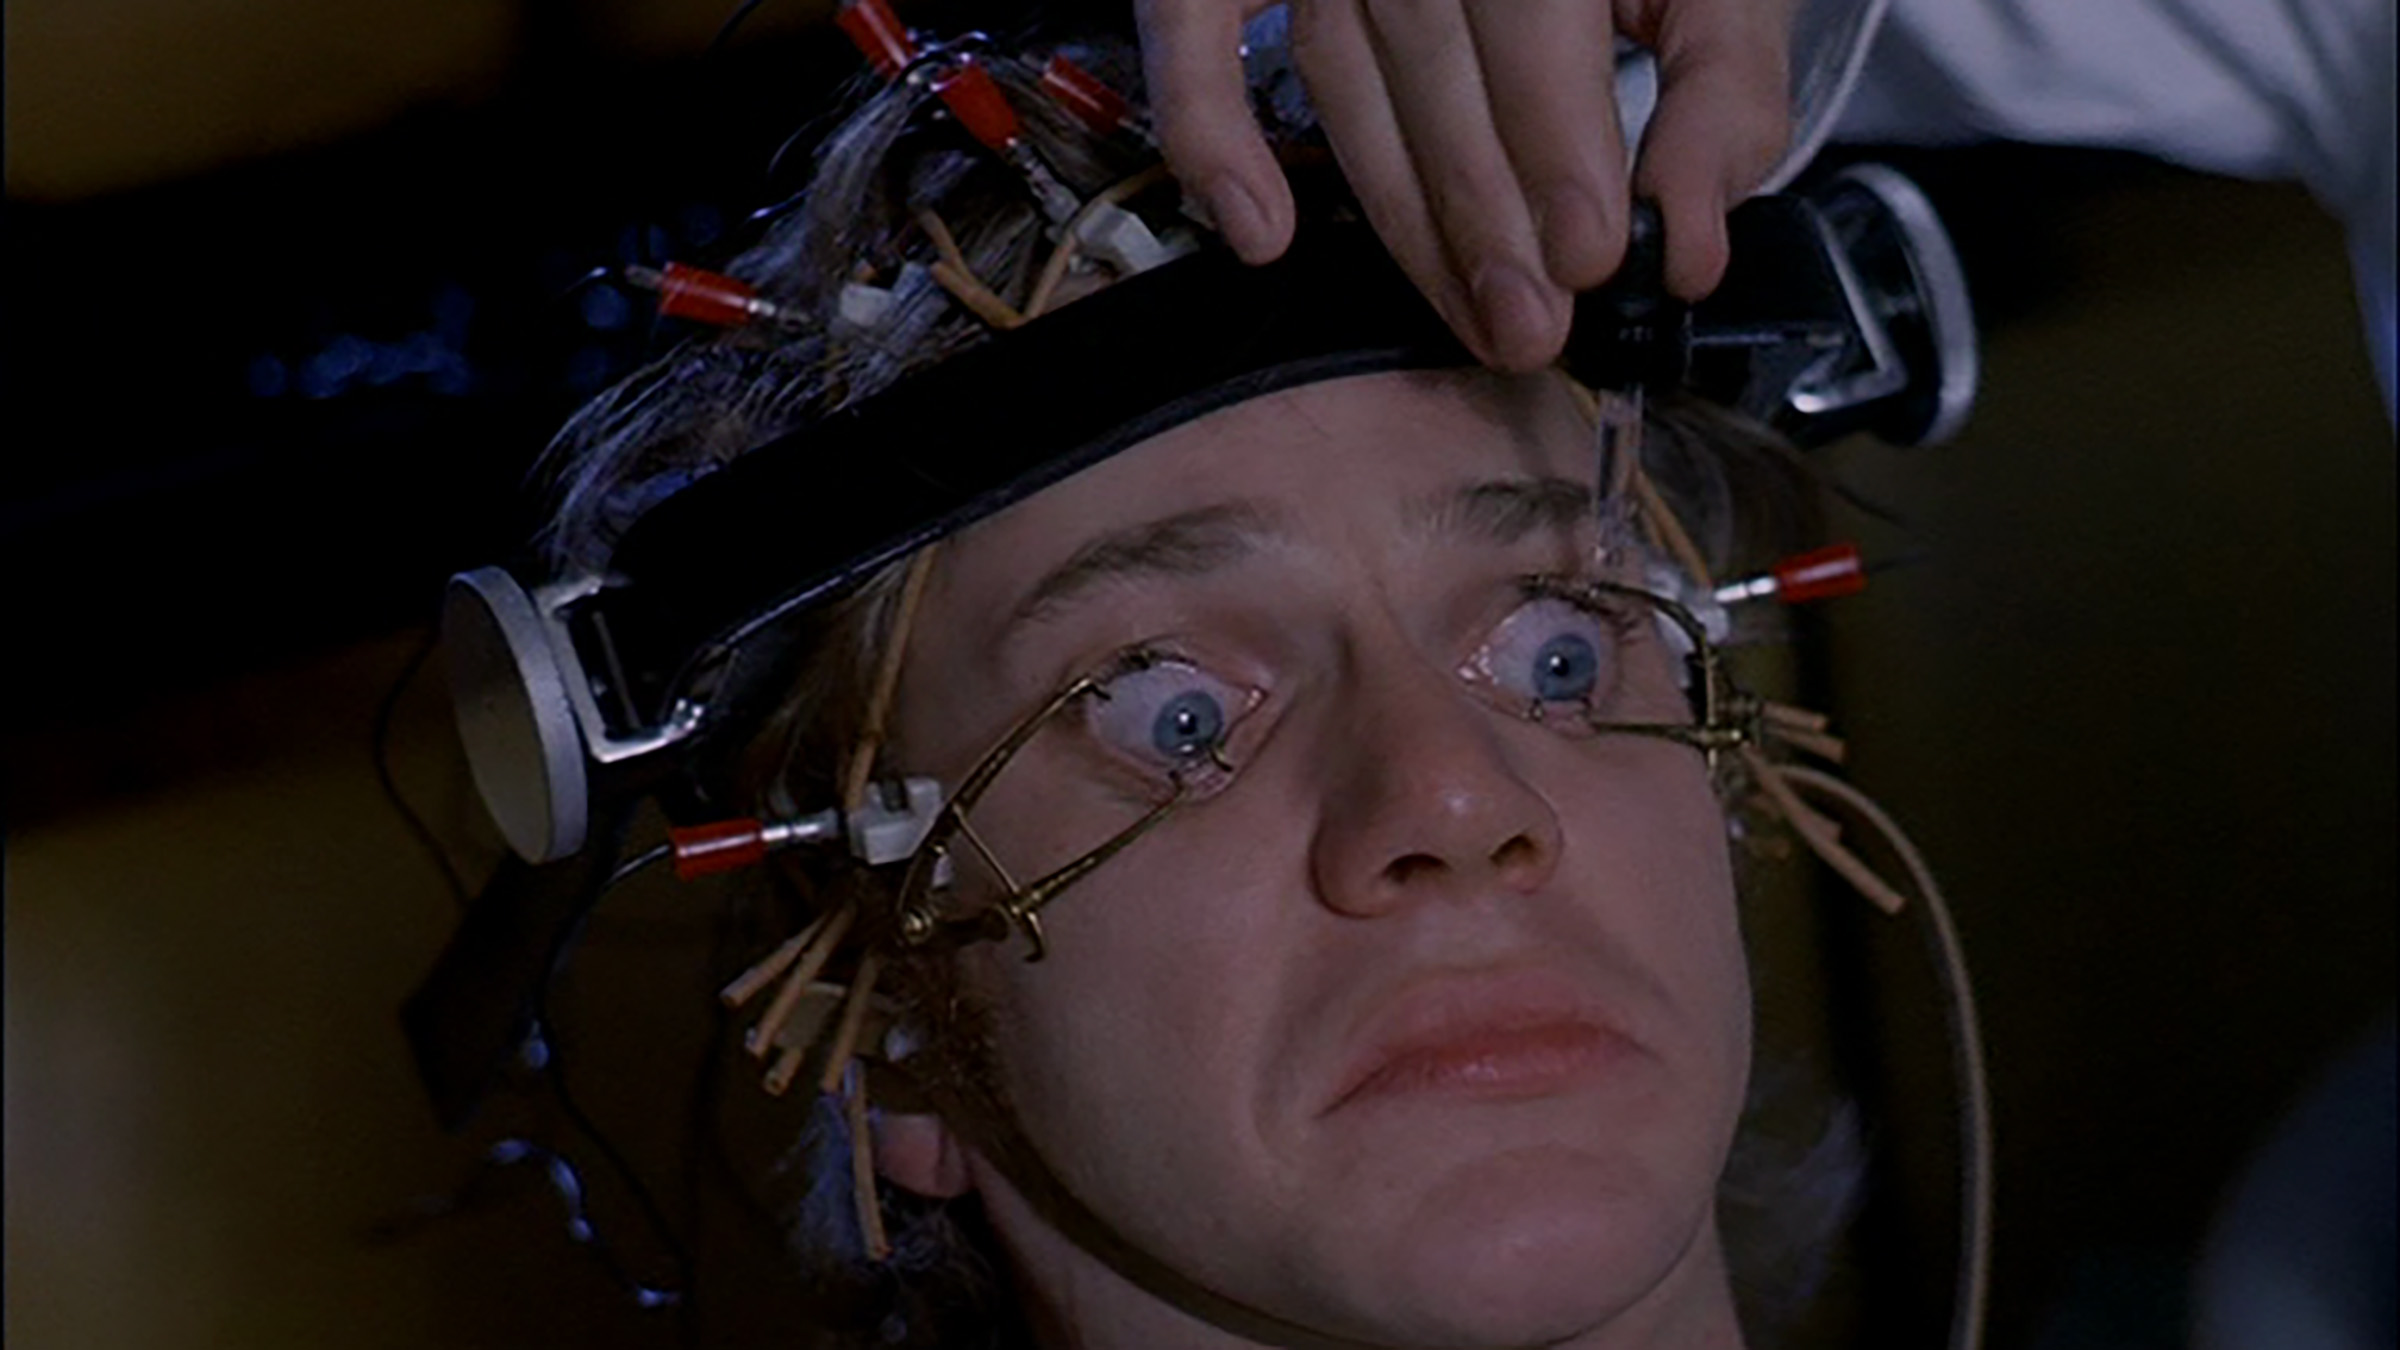 Still taken from A Clockwork Orange. Directed by Stanley Kubrick. Cinematography by John Alcott.